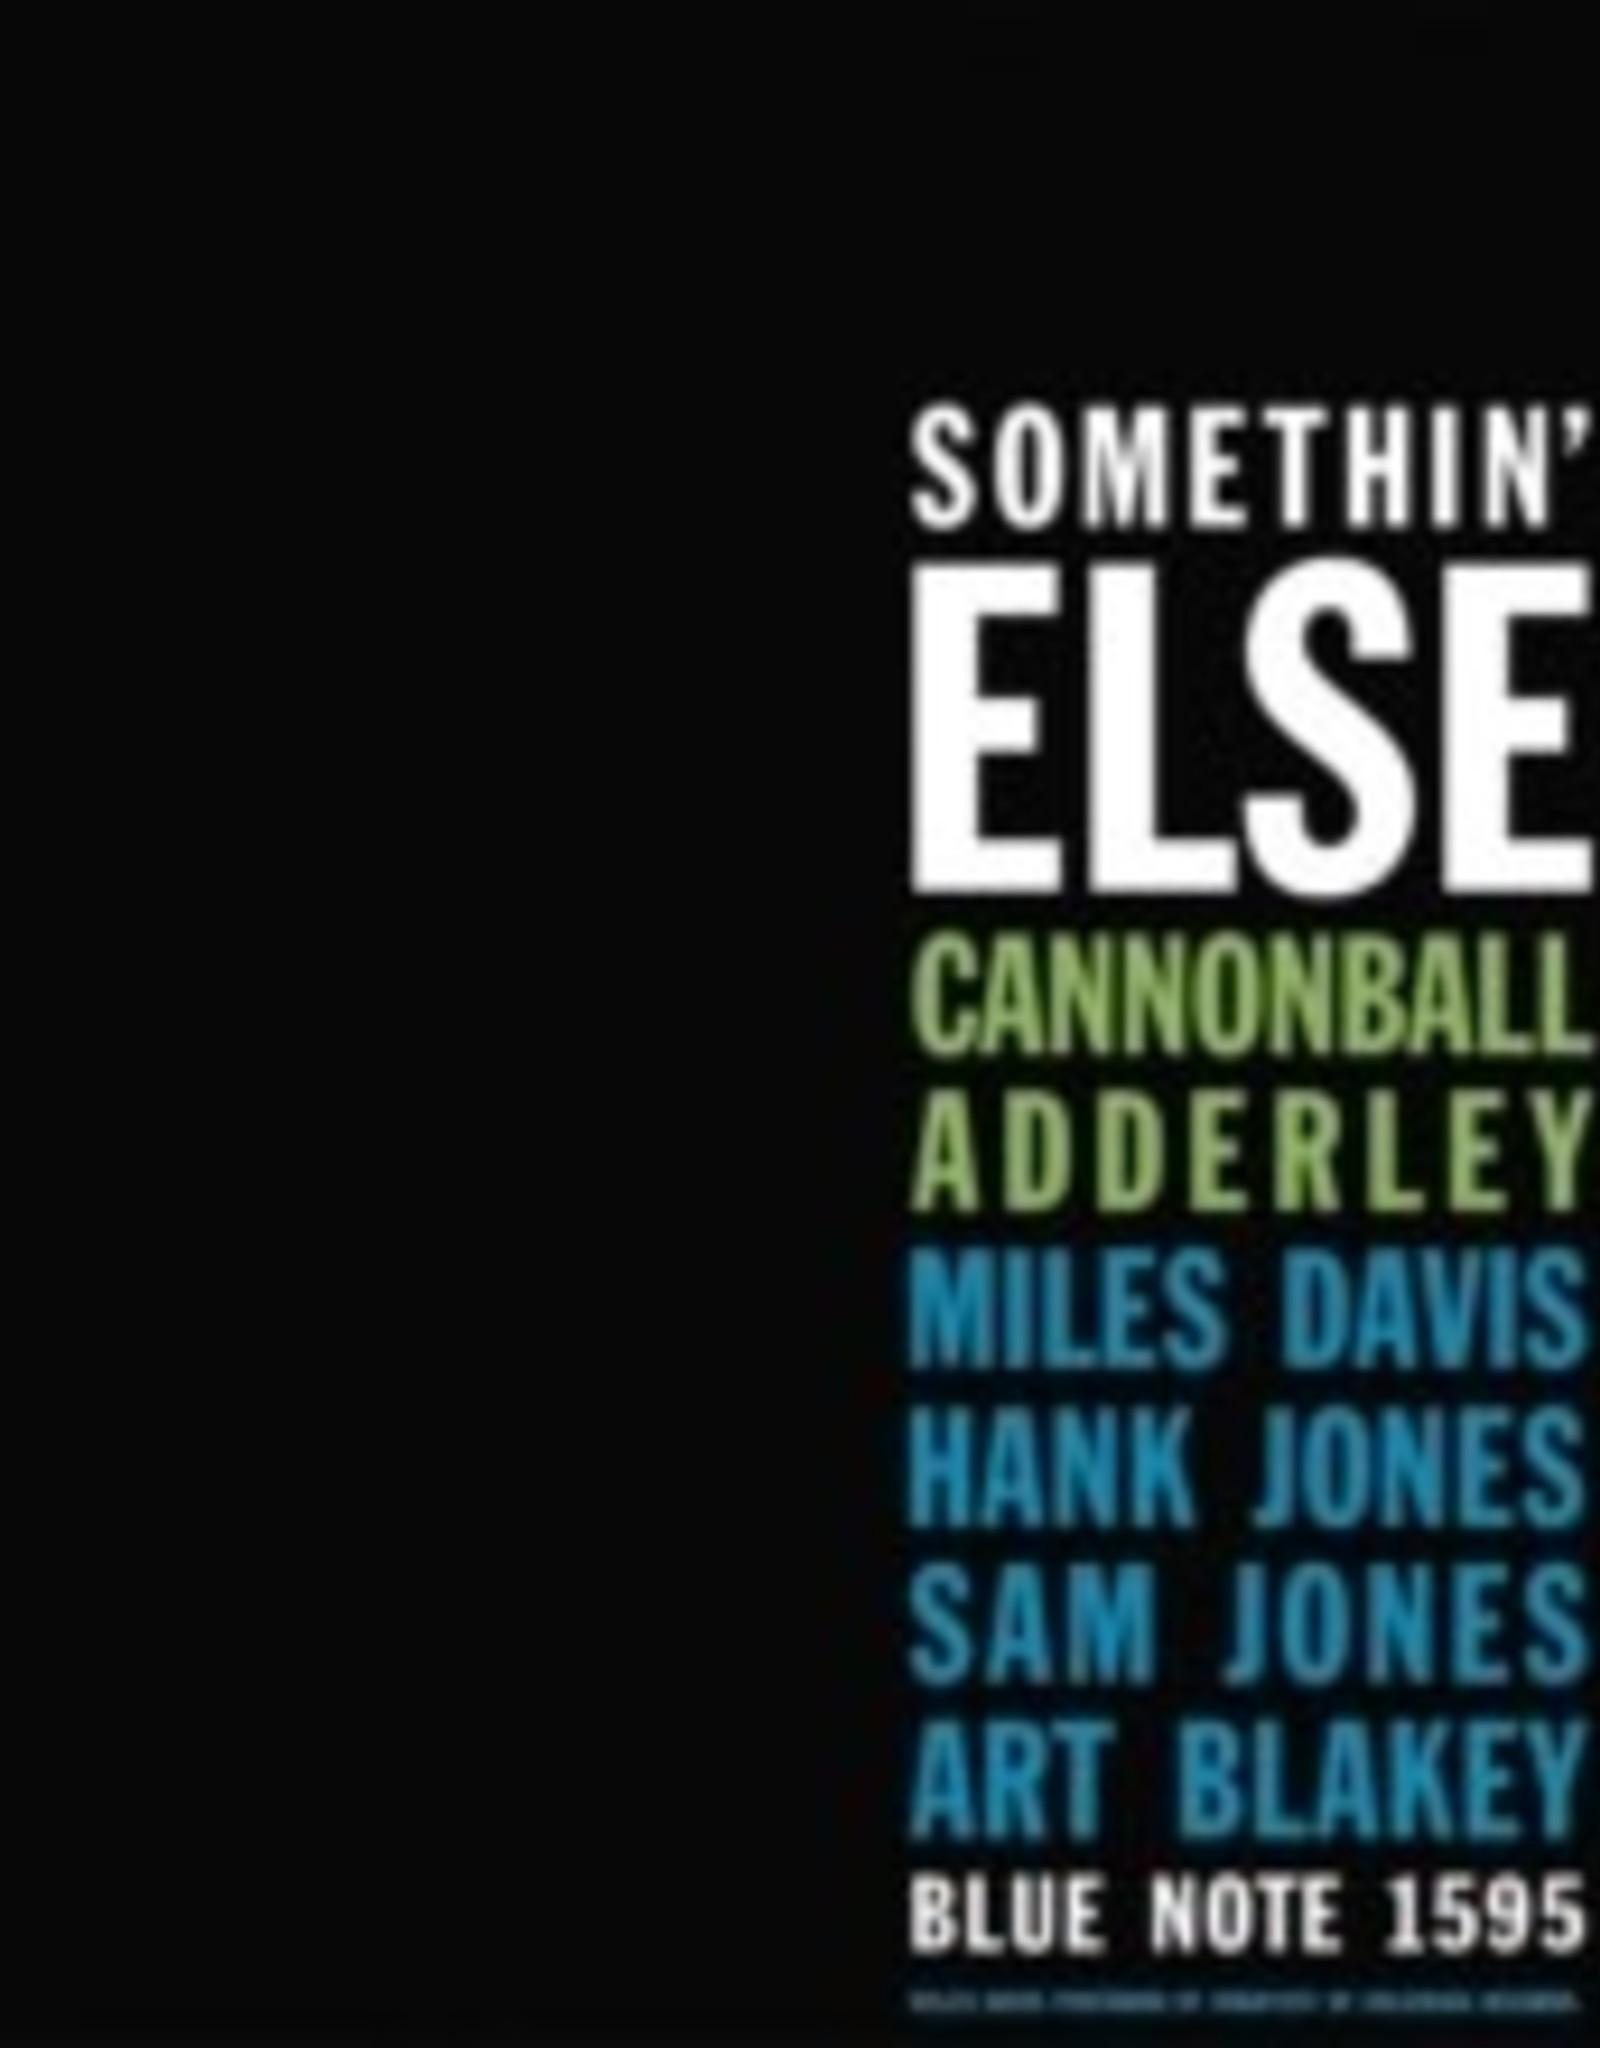 Cannonball Adderly - Somethin' Else (Analog Master)